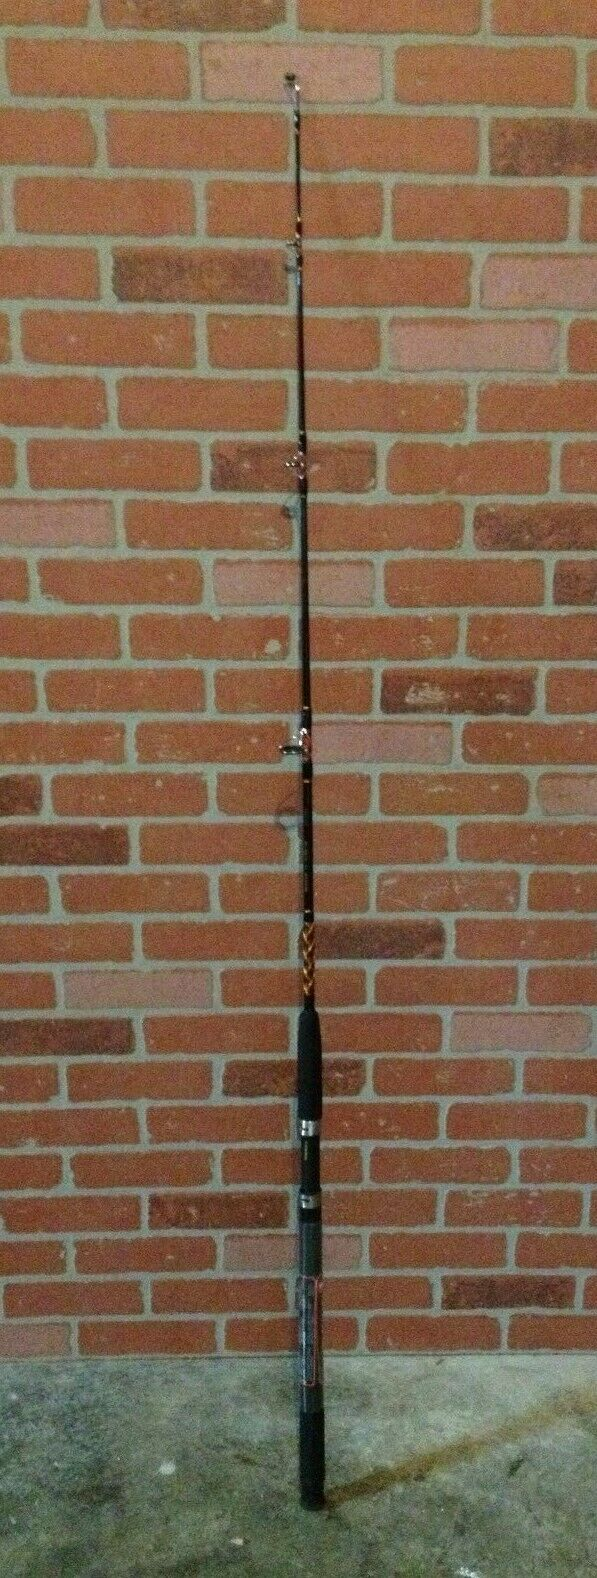 Penn Mariner Offshore Fishing Rod MB1025S56 5'6' 10-25lb 01F